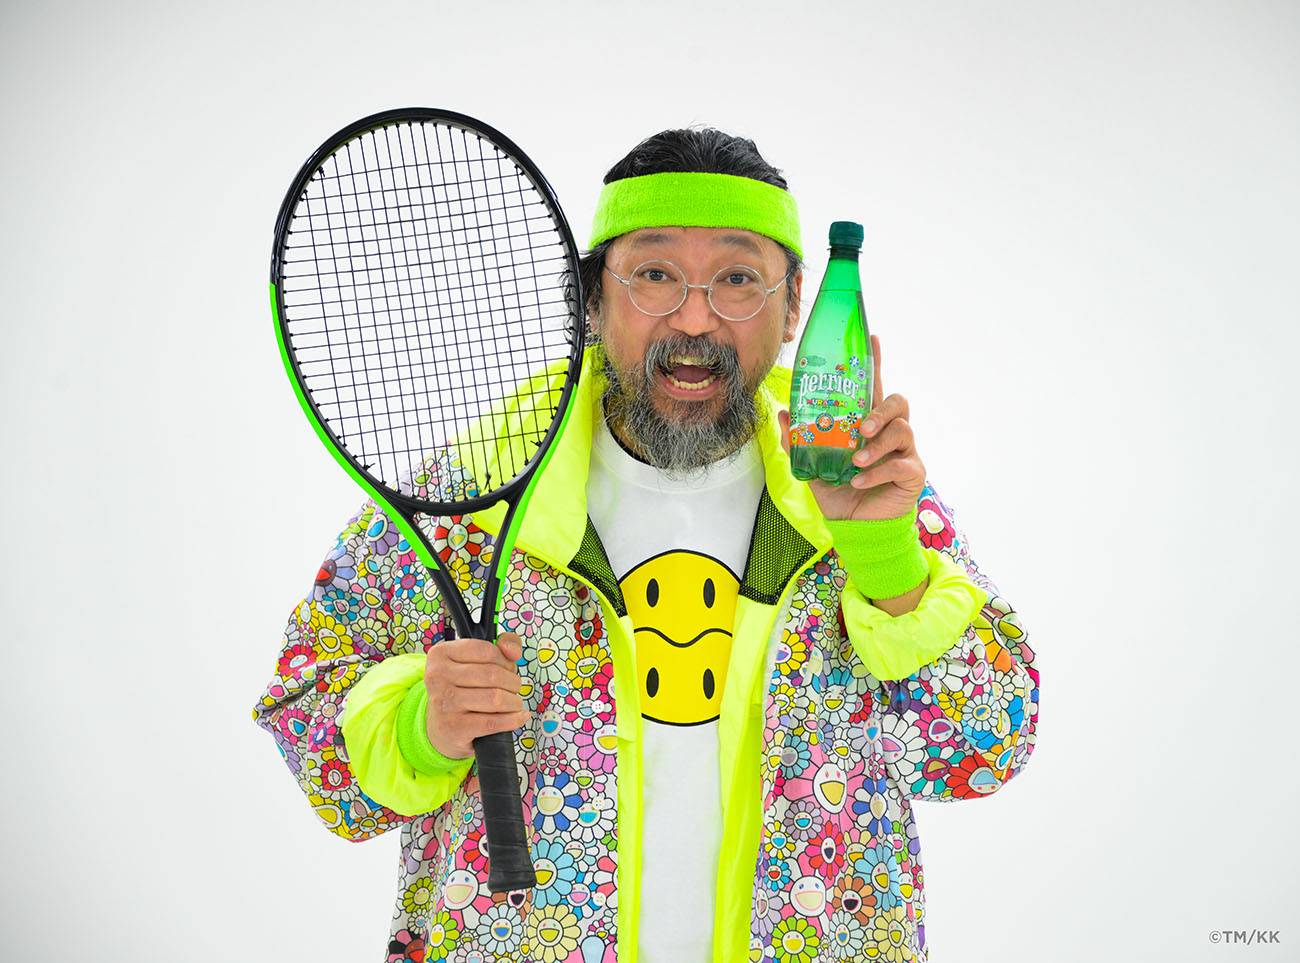 PERRIER x Takashi Murakami - Roland-Garros 2021